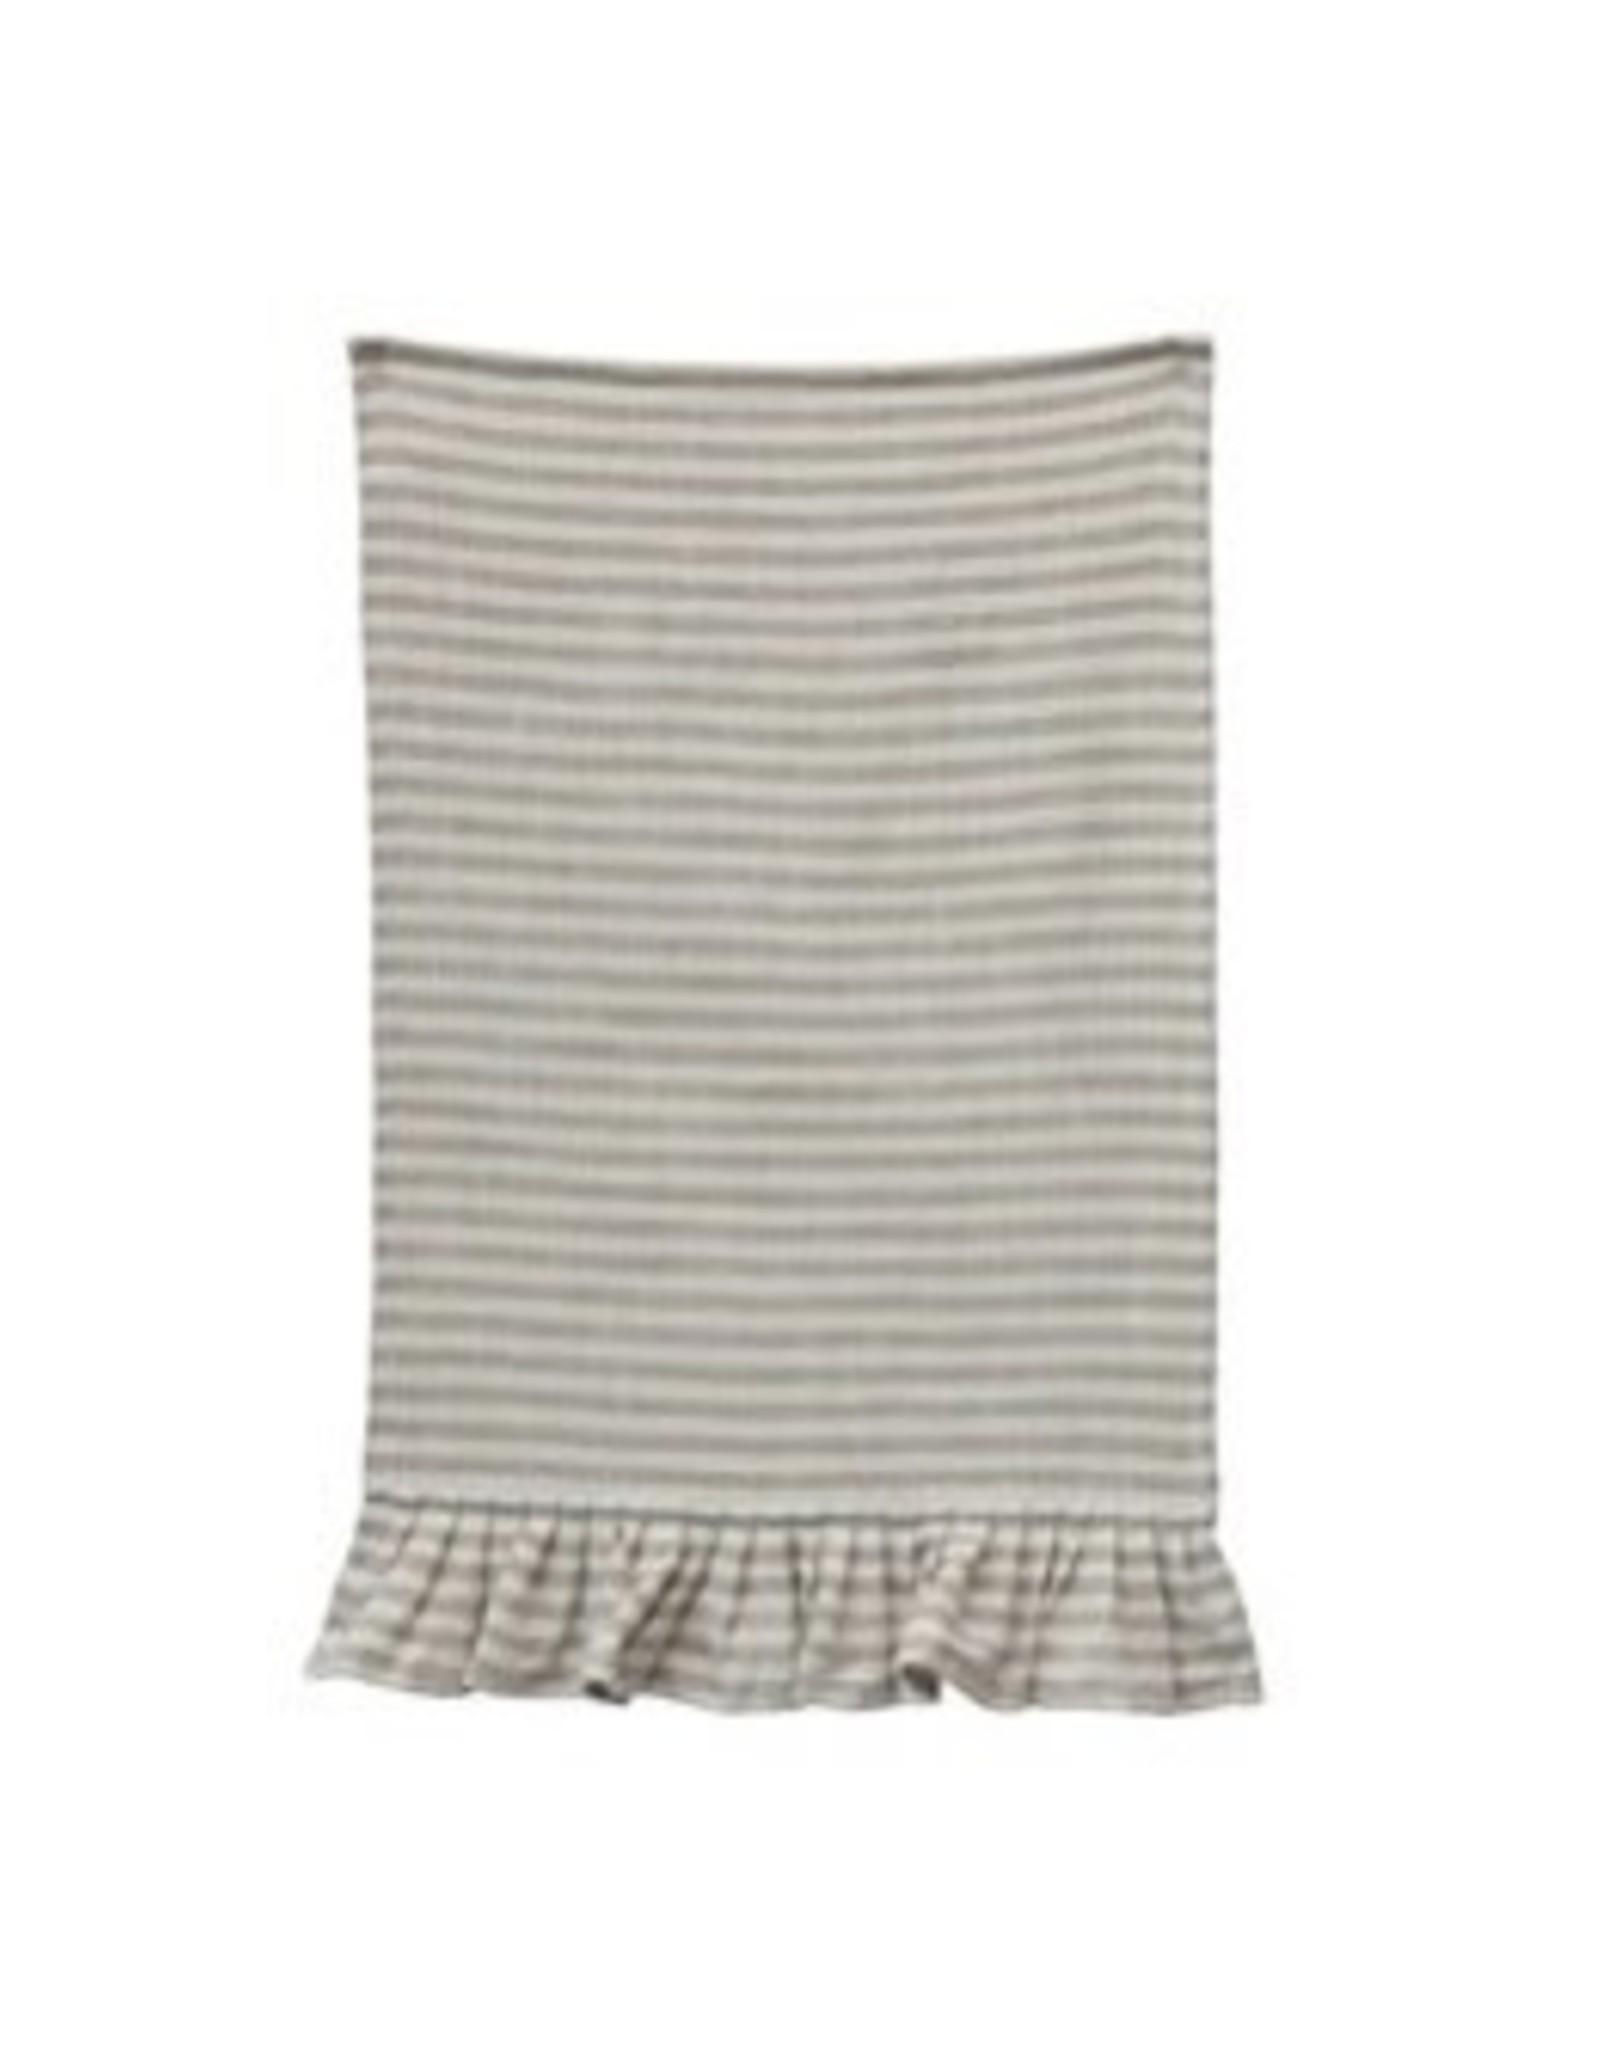 "Creative Co-op 28""L x 18""W  Striped Tea Towel w/ Ruffle - Natural"